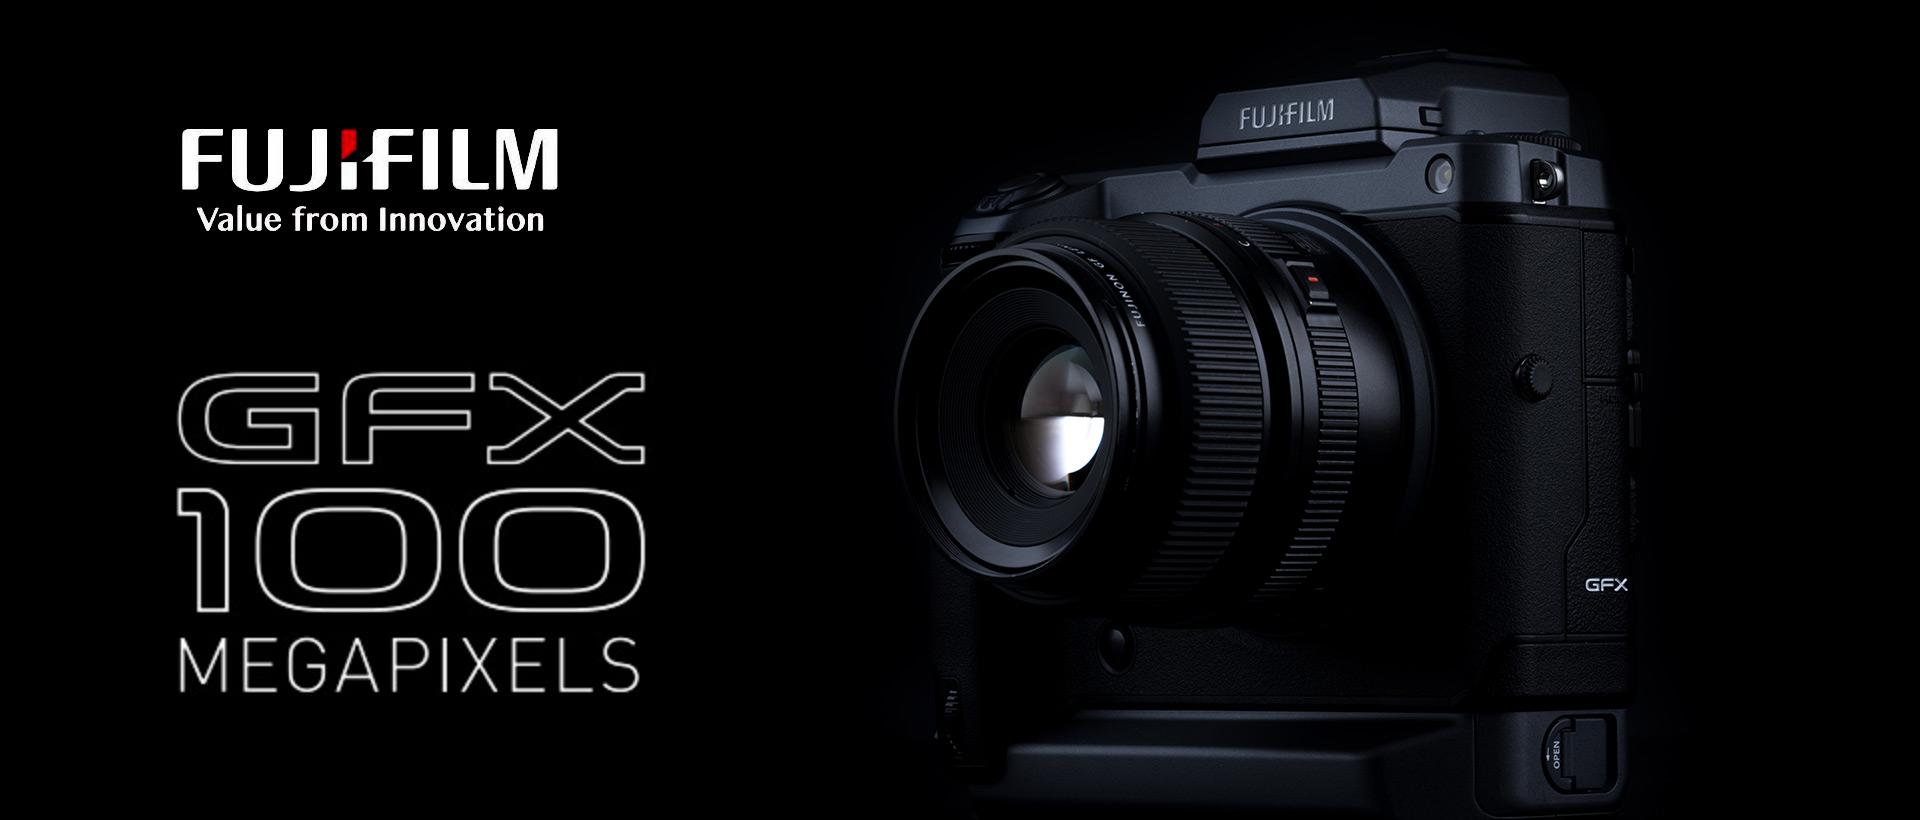 Fujifilm GFX100 Megapixel